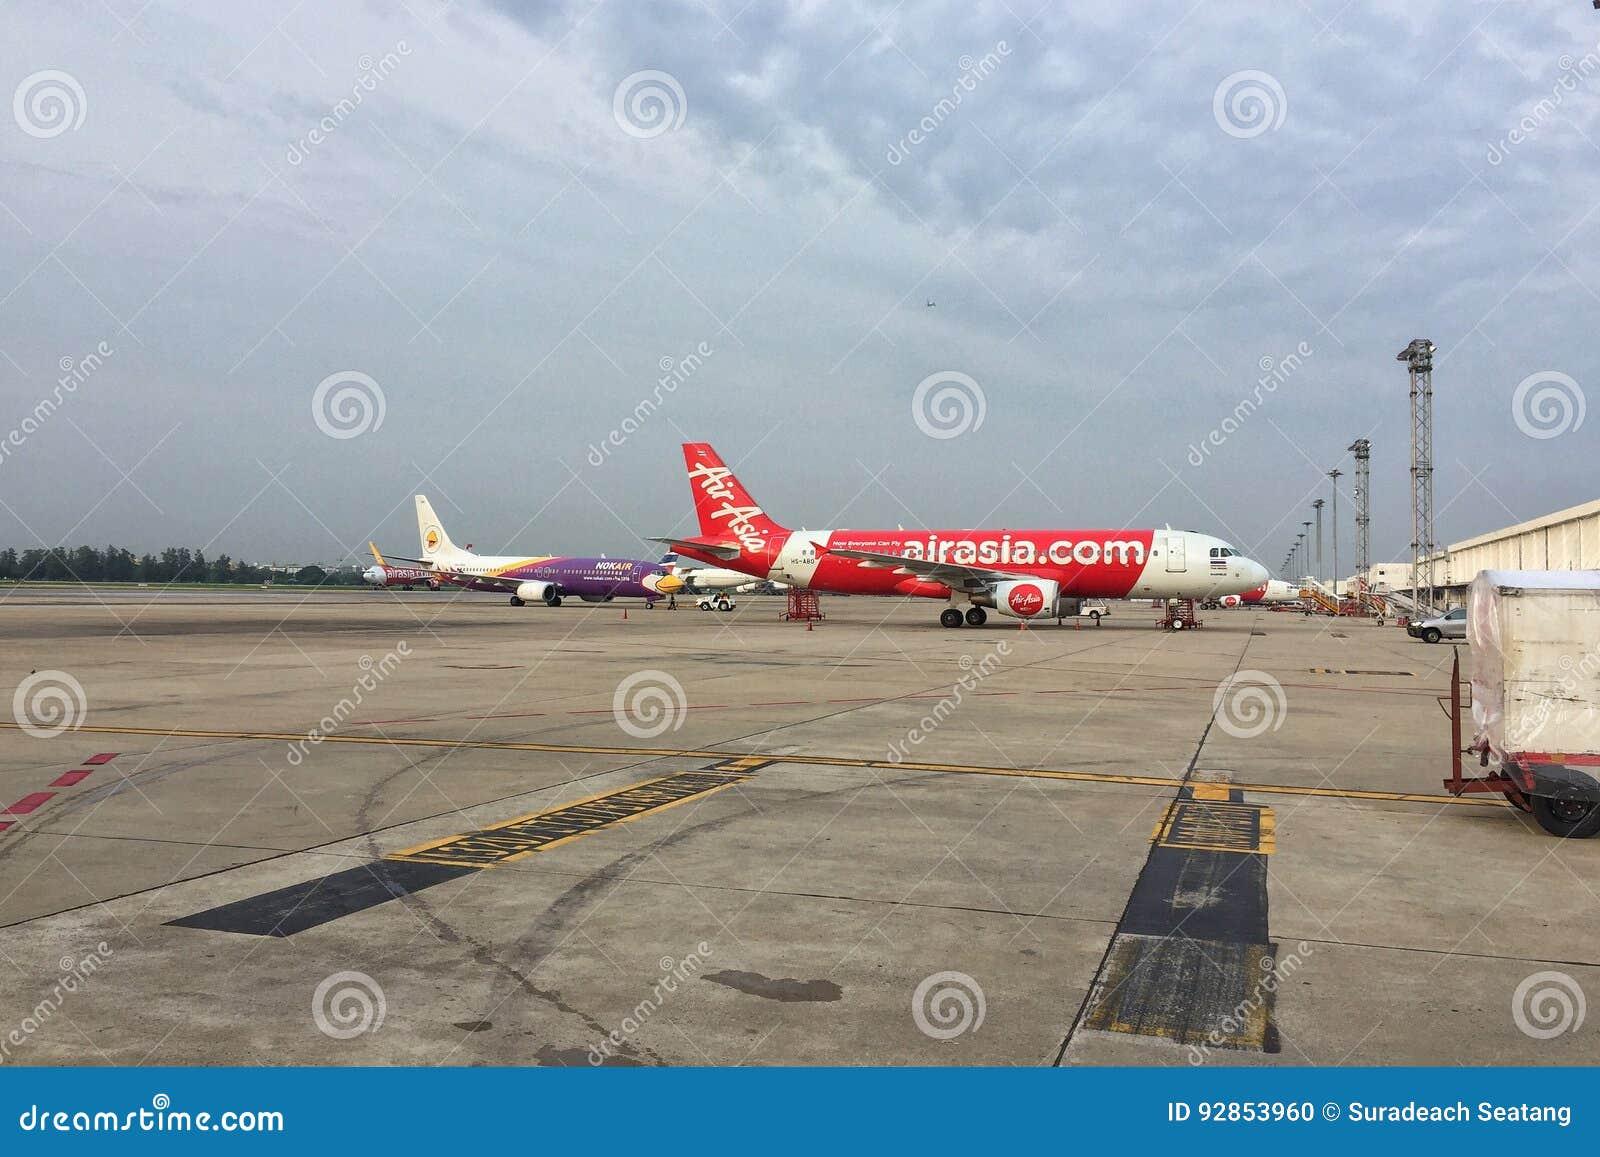 Air Asia`s A320-200 aircraft at Don Mueang airport